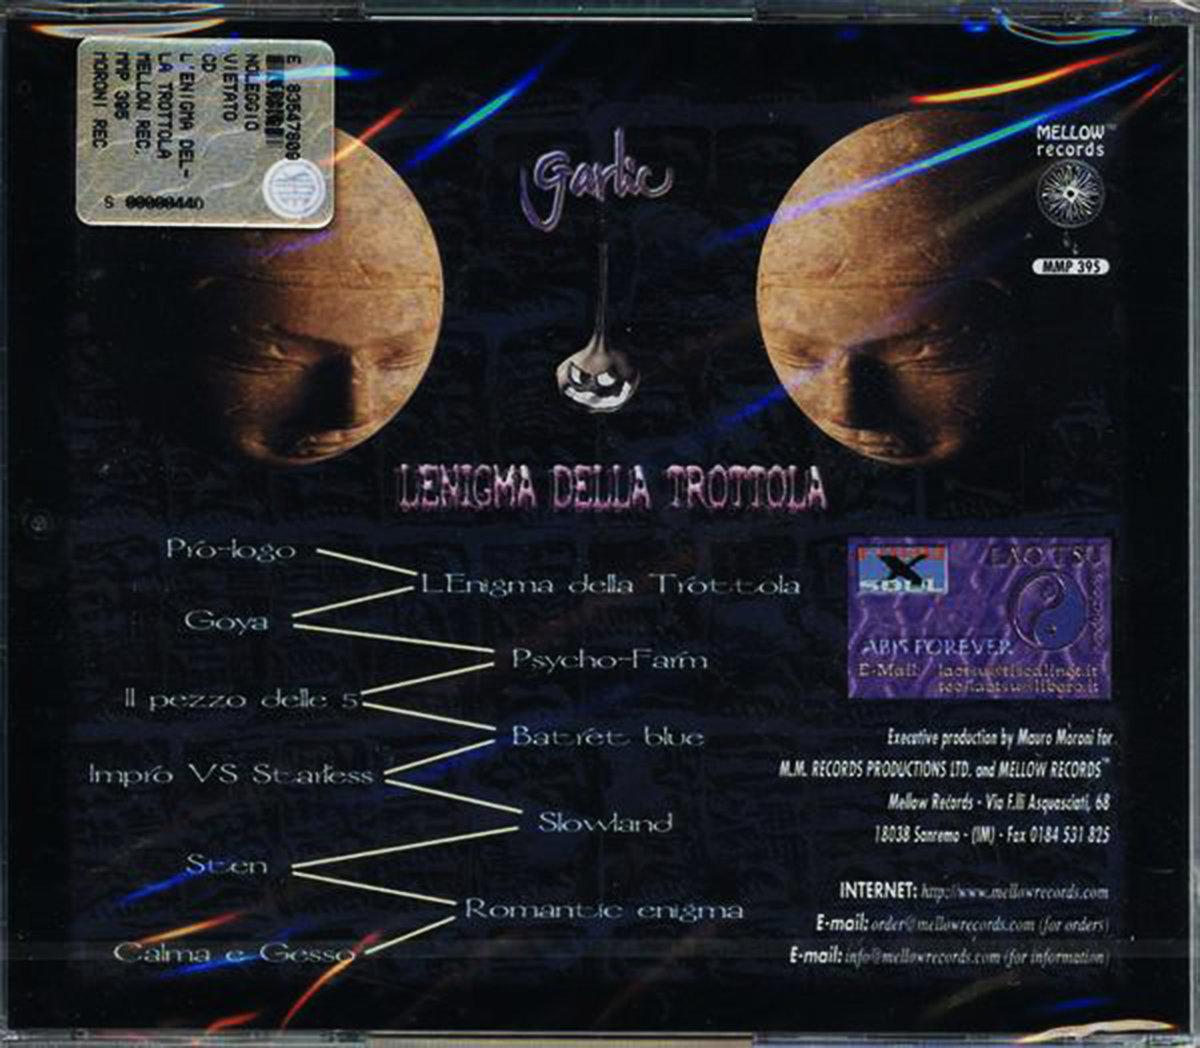 L'Enigma della Trottola | Mellow label productions